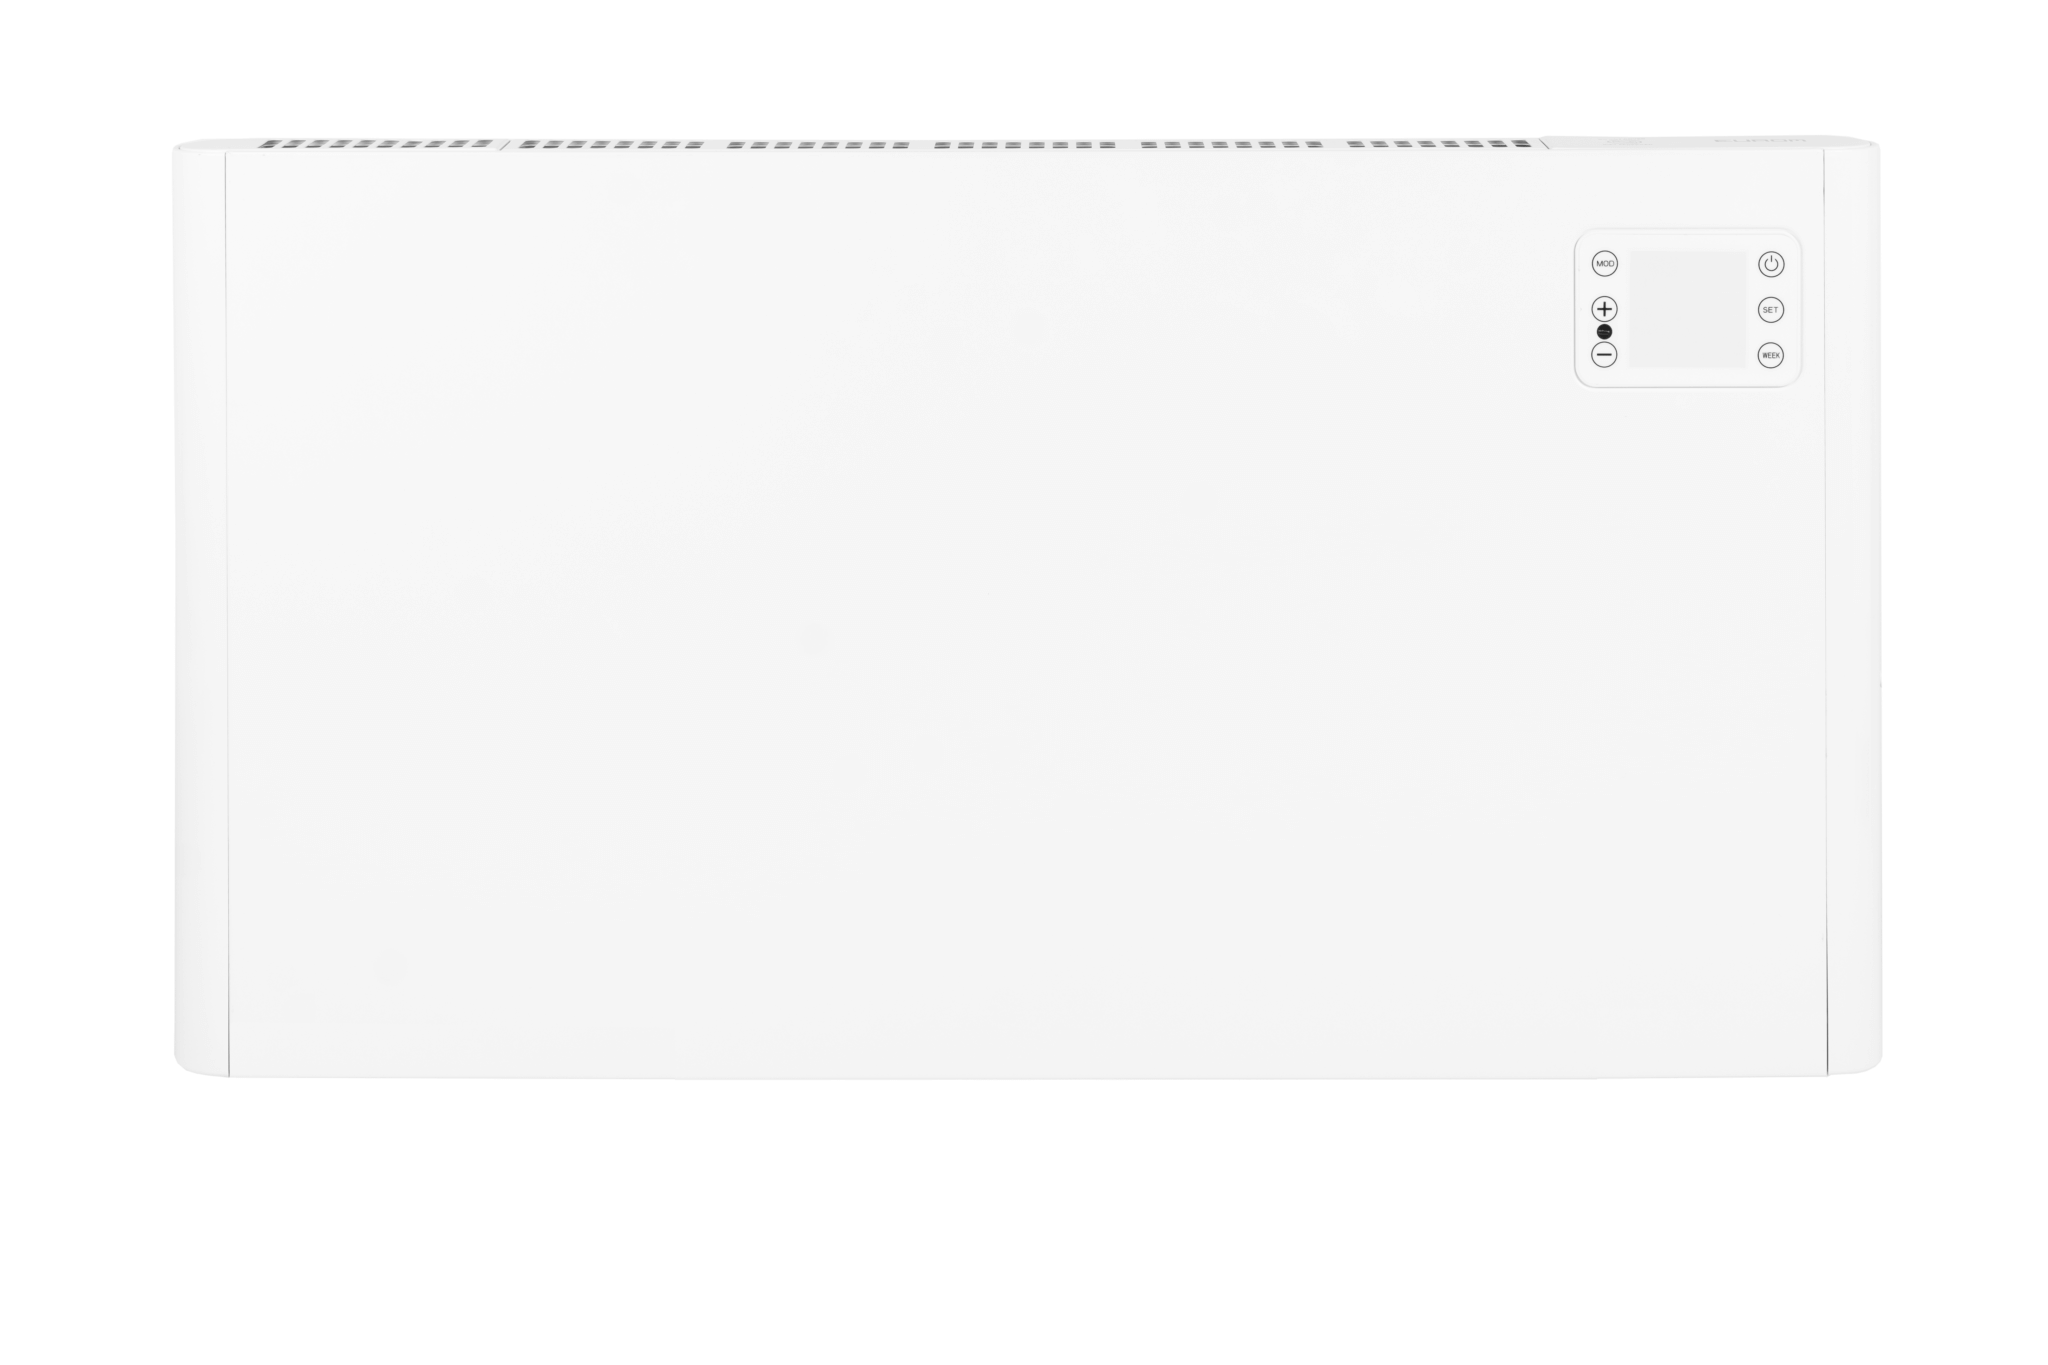 Eurom Alutherm 1500 WiFi Convectorkachel | Moderne Kachel met LED Display